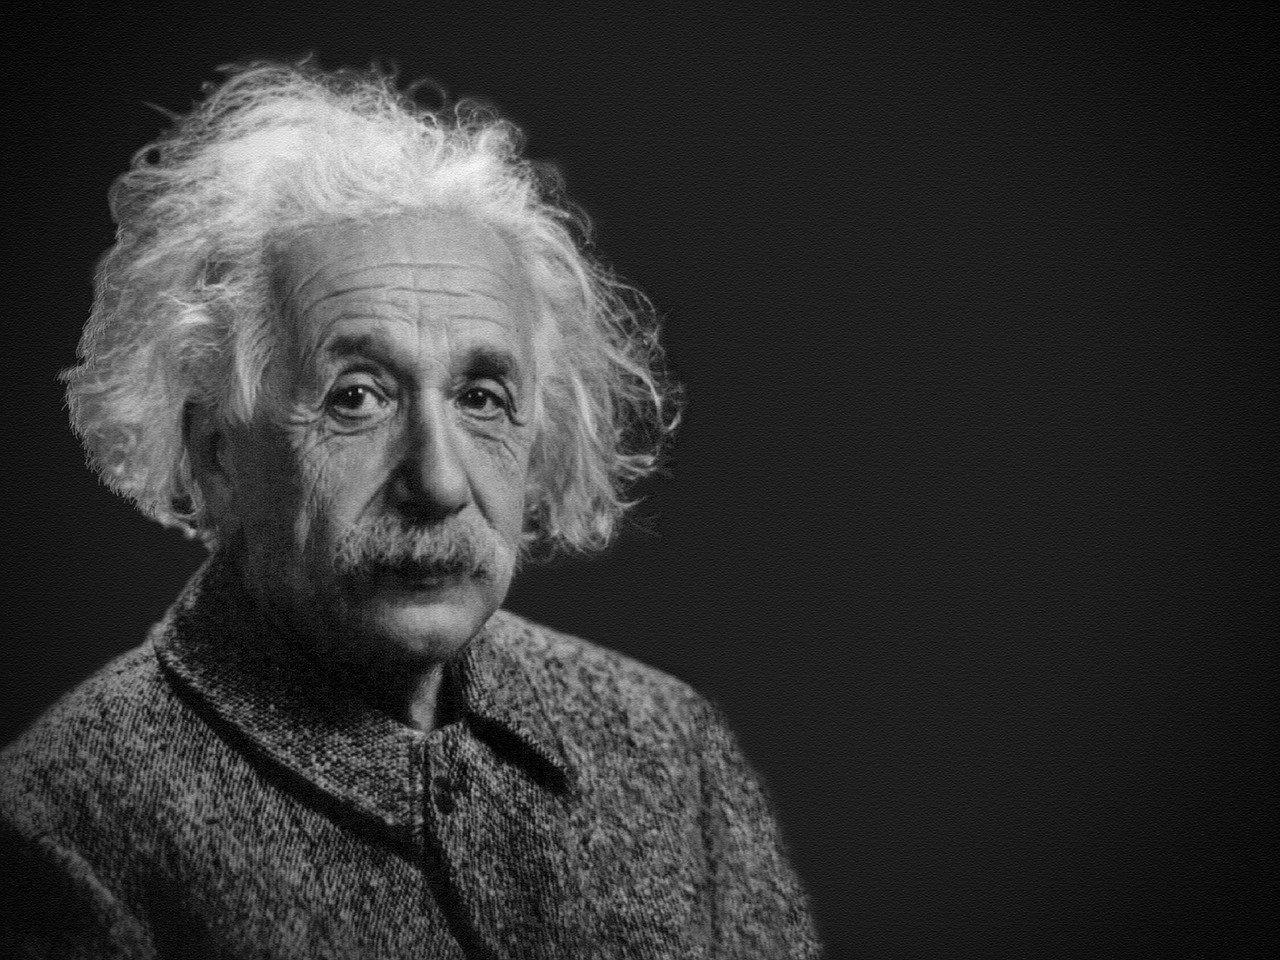 Albert Einstein risponde alle tue domande. Ecco come thumbnail